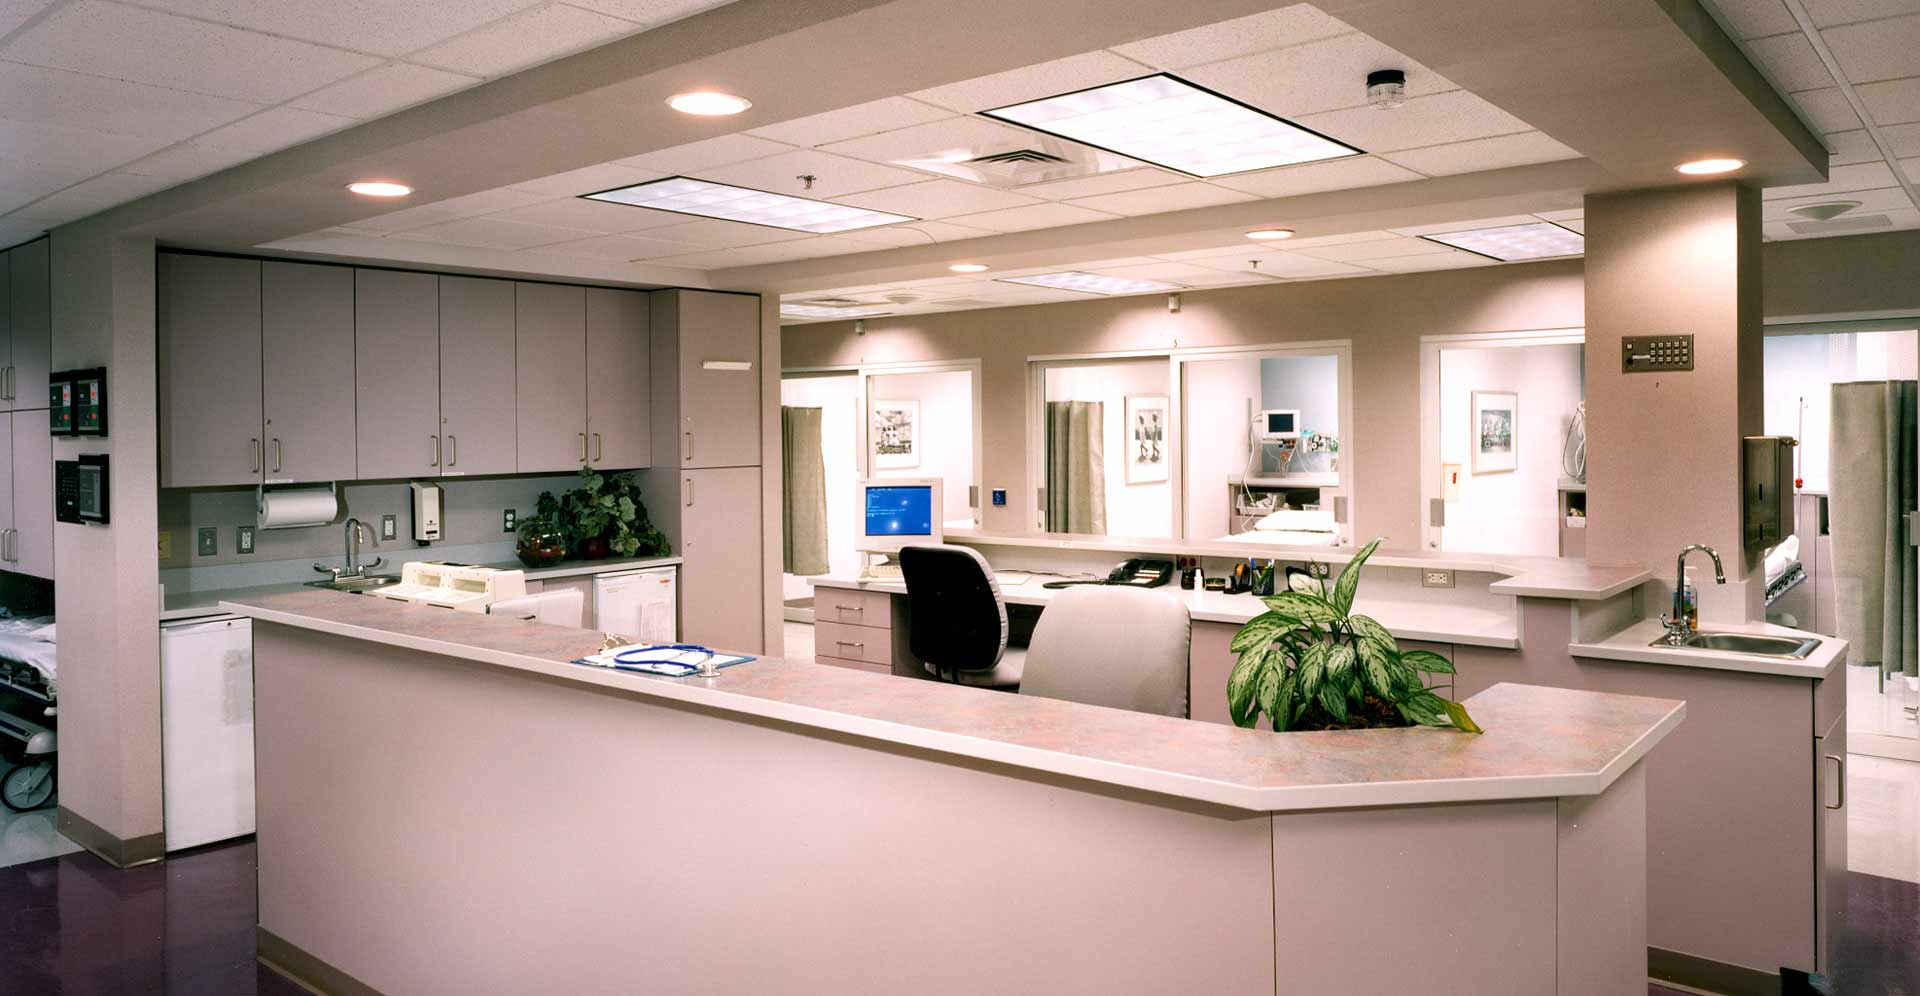 Gastroenterology Center